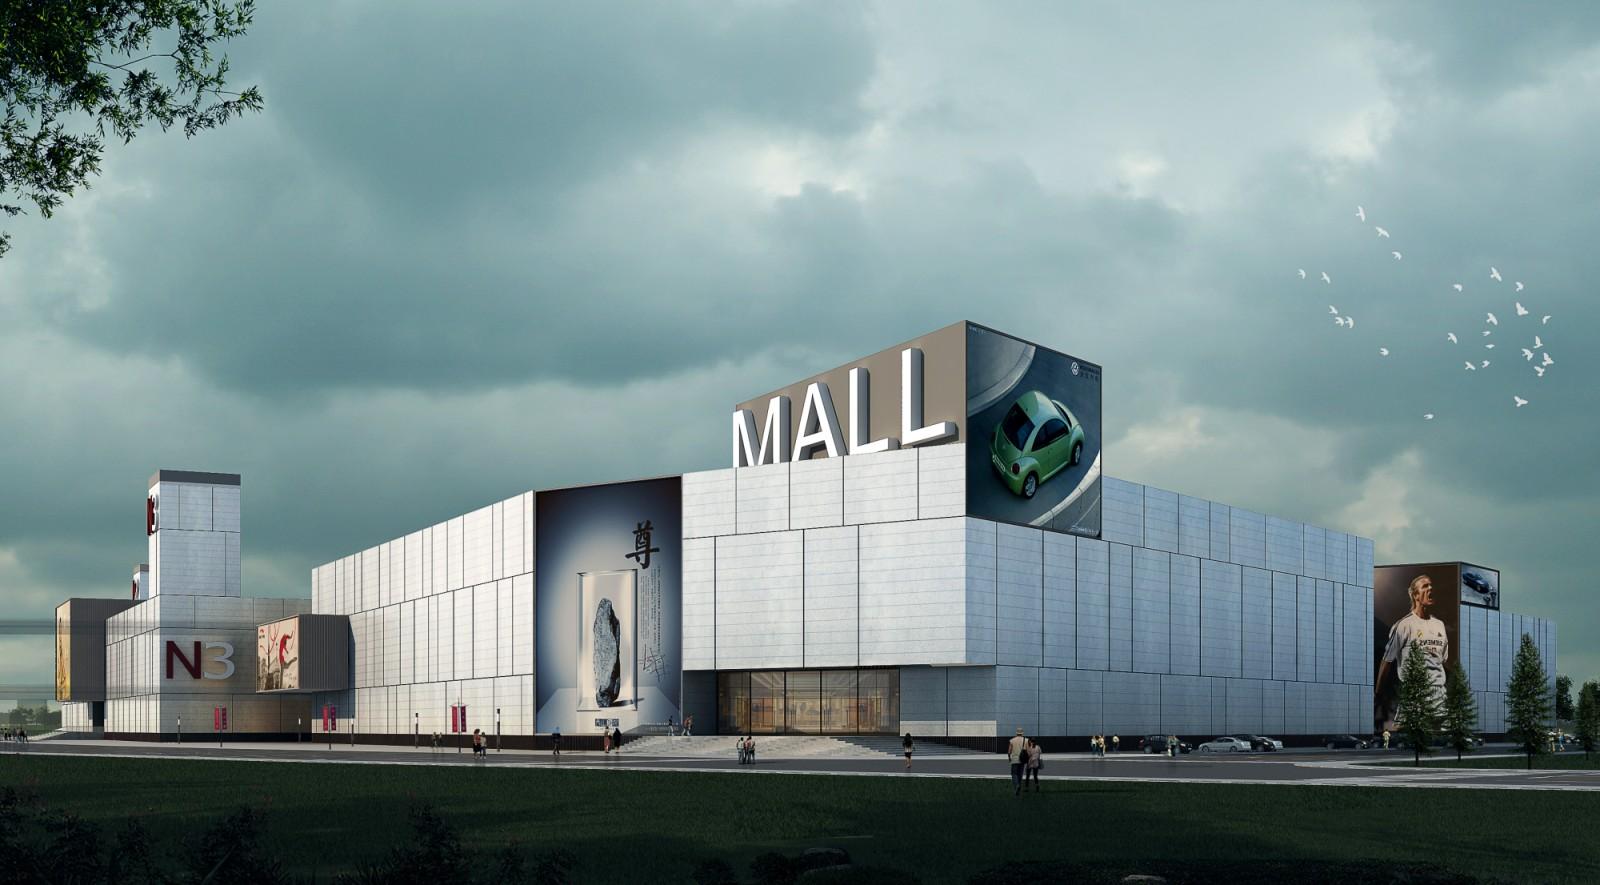 Hna E-Field Retail Center